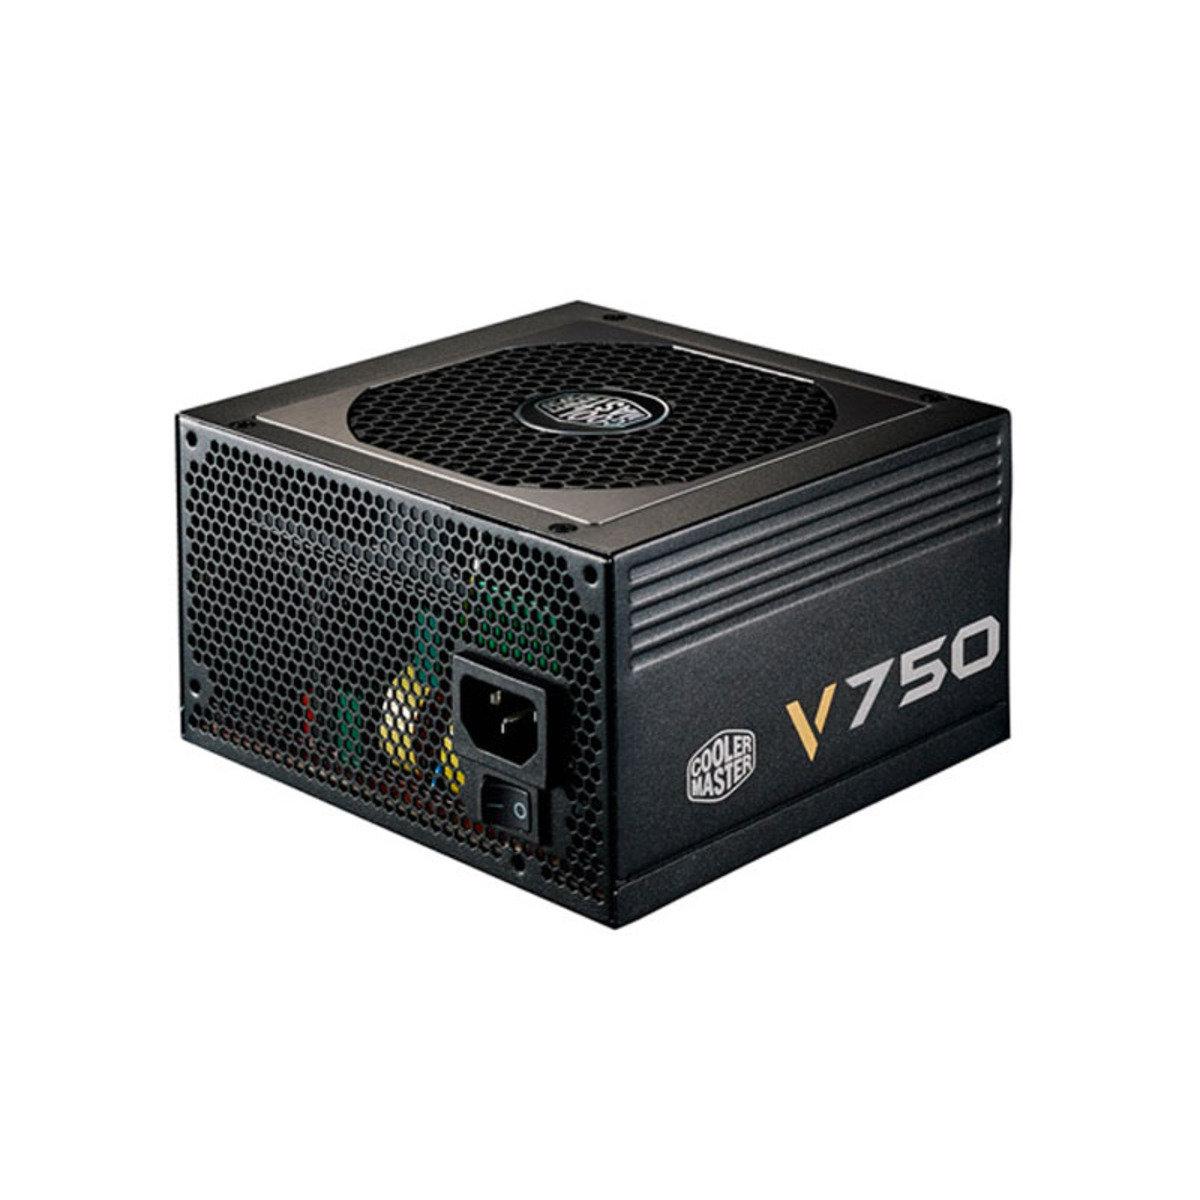 80Plus金認證 極致專家系列 V750 750w 電腦變壓器